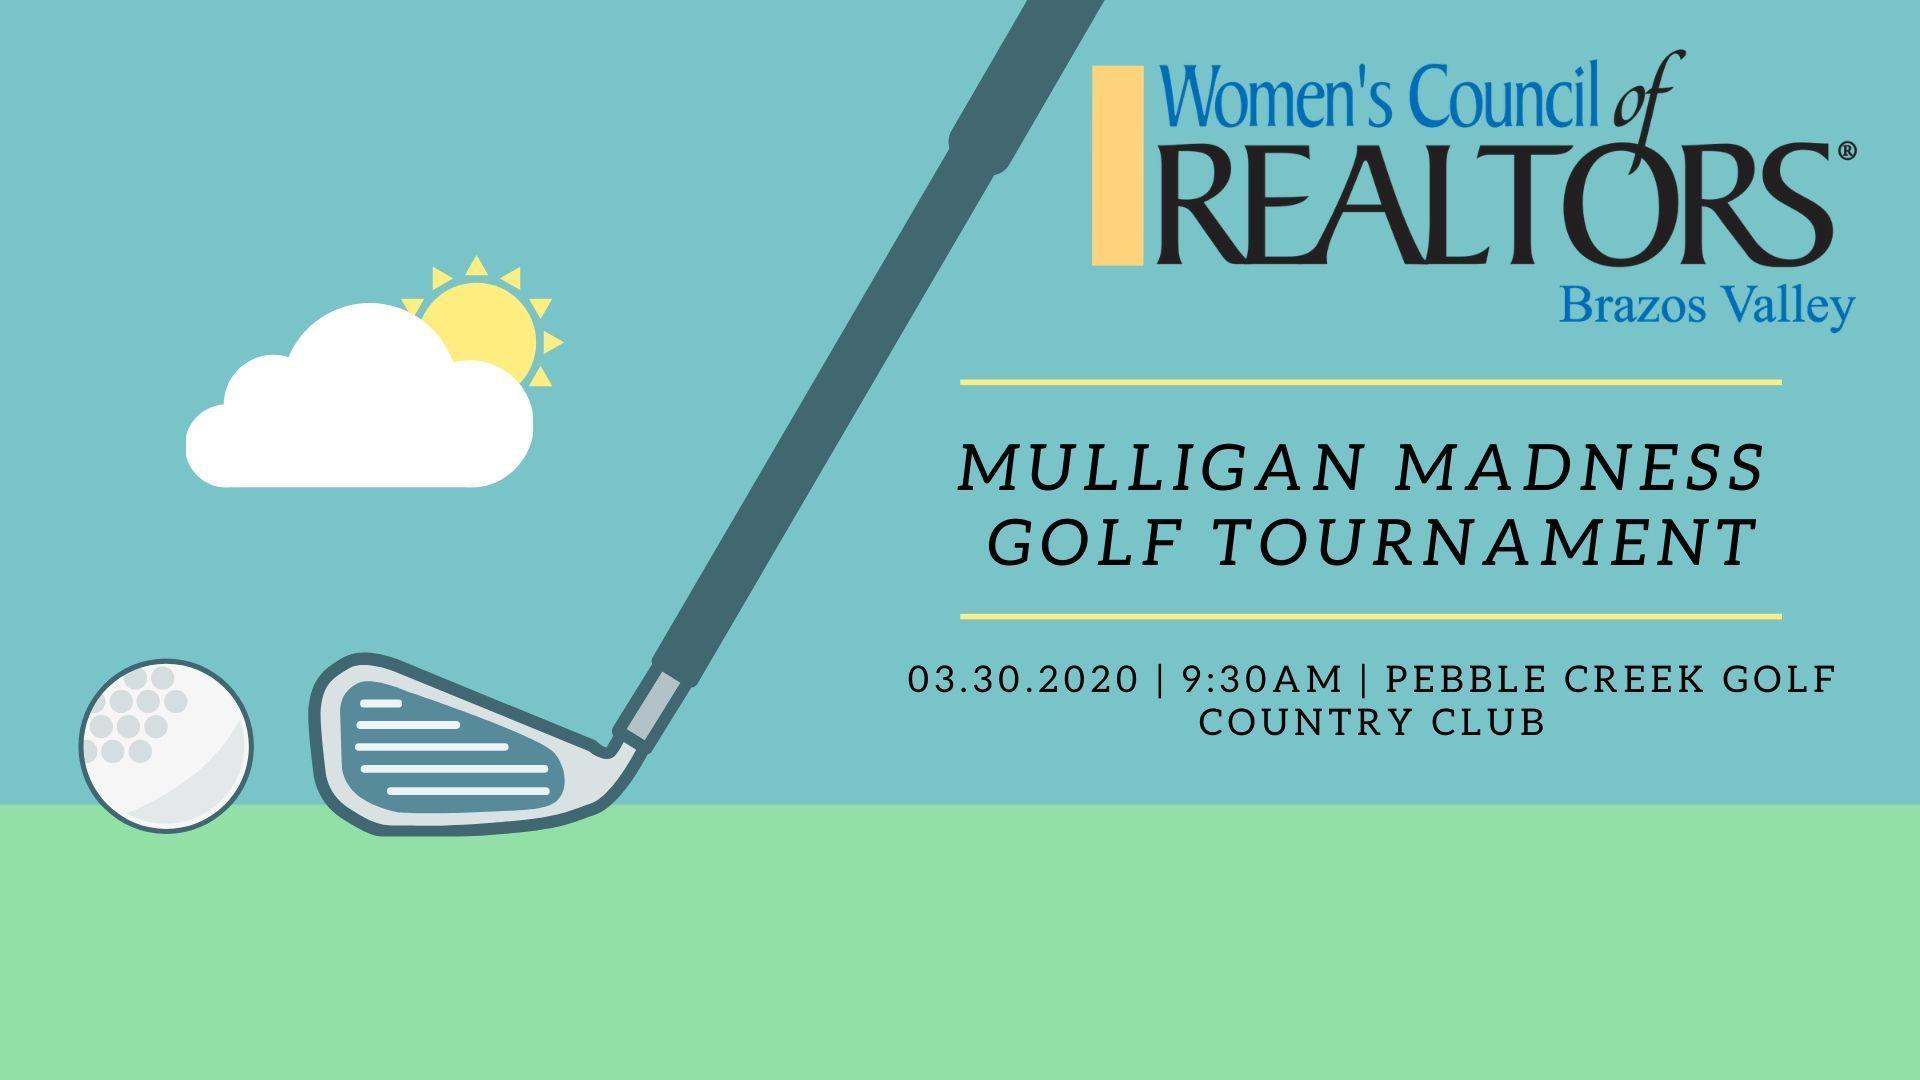 Mulligan Madness Golf Tournament